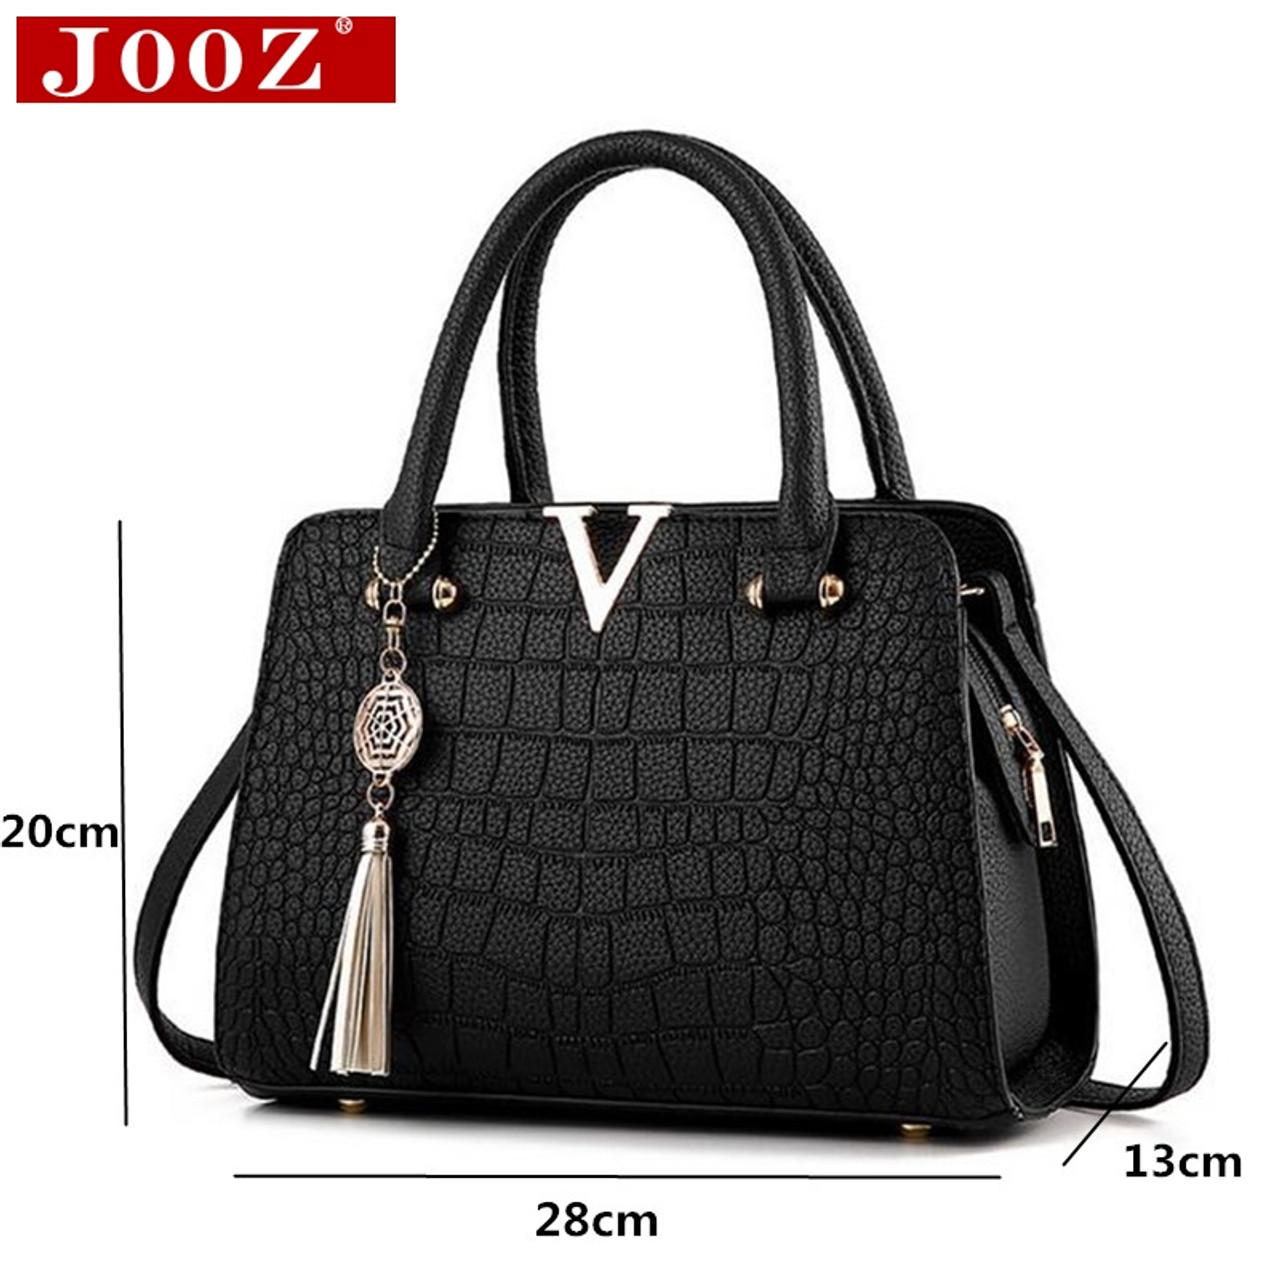 7507cf4e8cb2 ... Crocodile leather Women Bag V letters Designer Handbags Luxury quality  Lady Shoulder Crossbody Bags fringed women ...